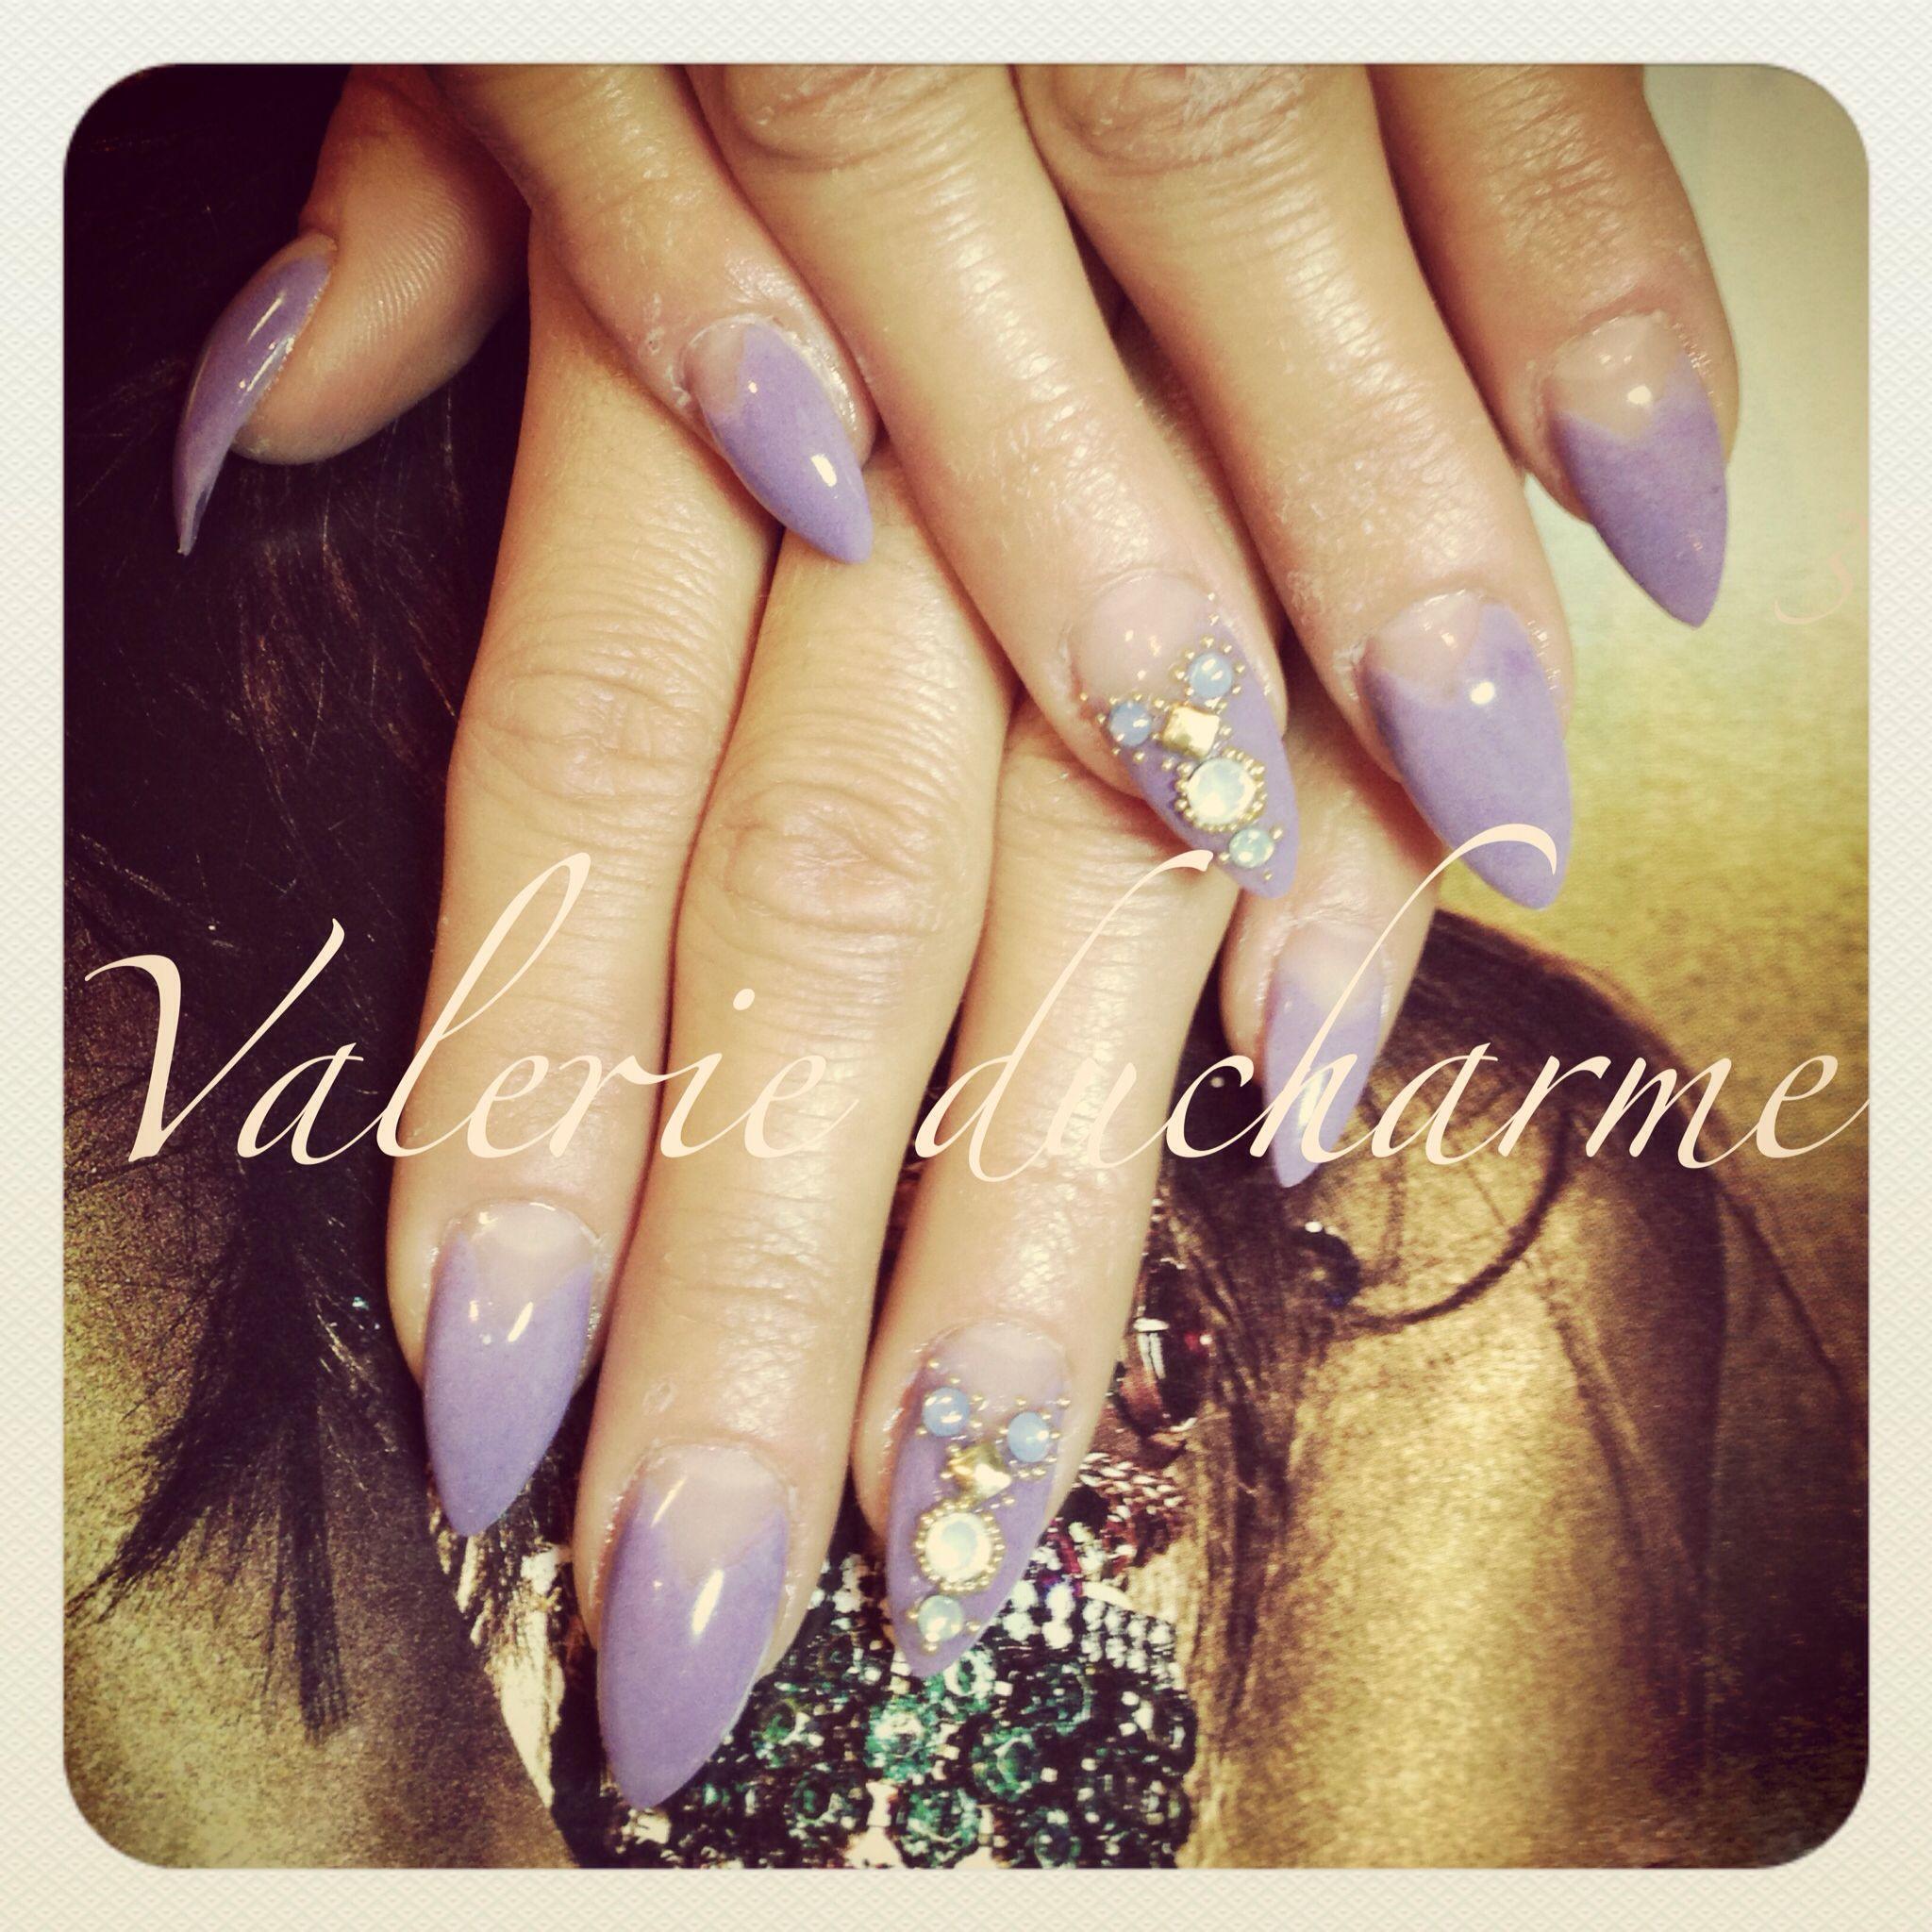 By valérie Ducharme at studio 2075, nails art nail design ...